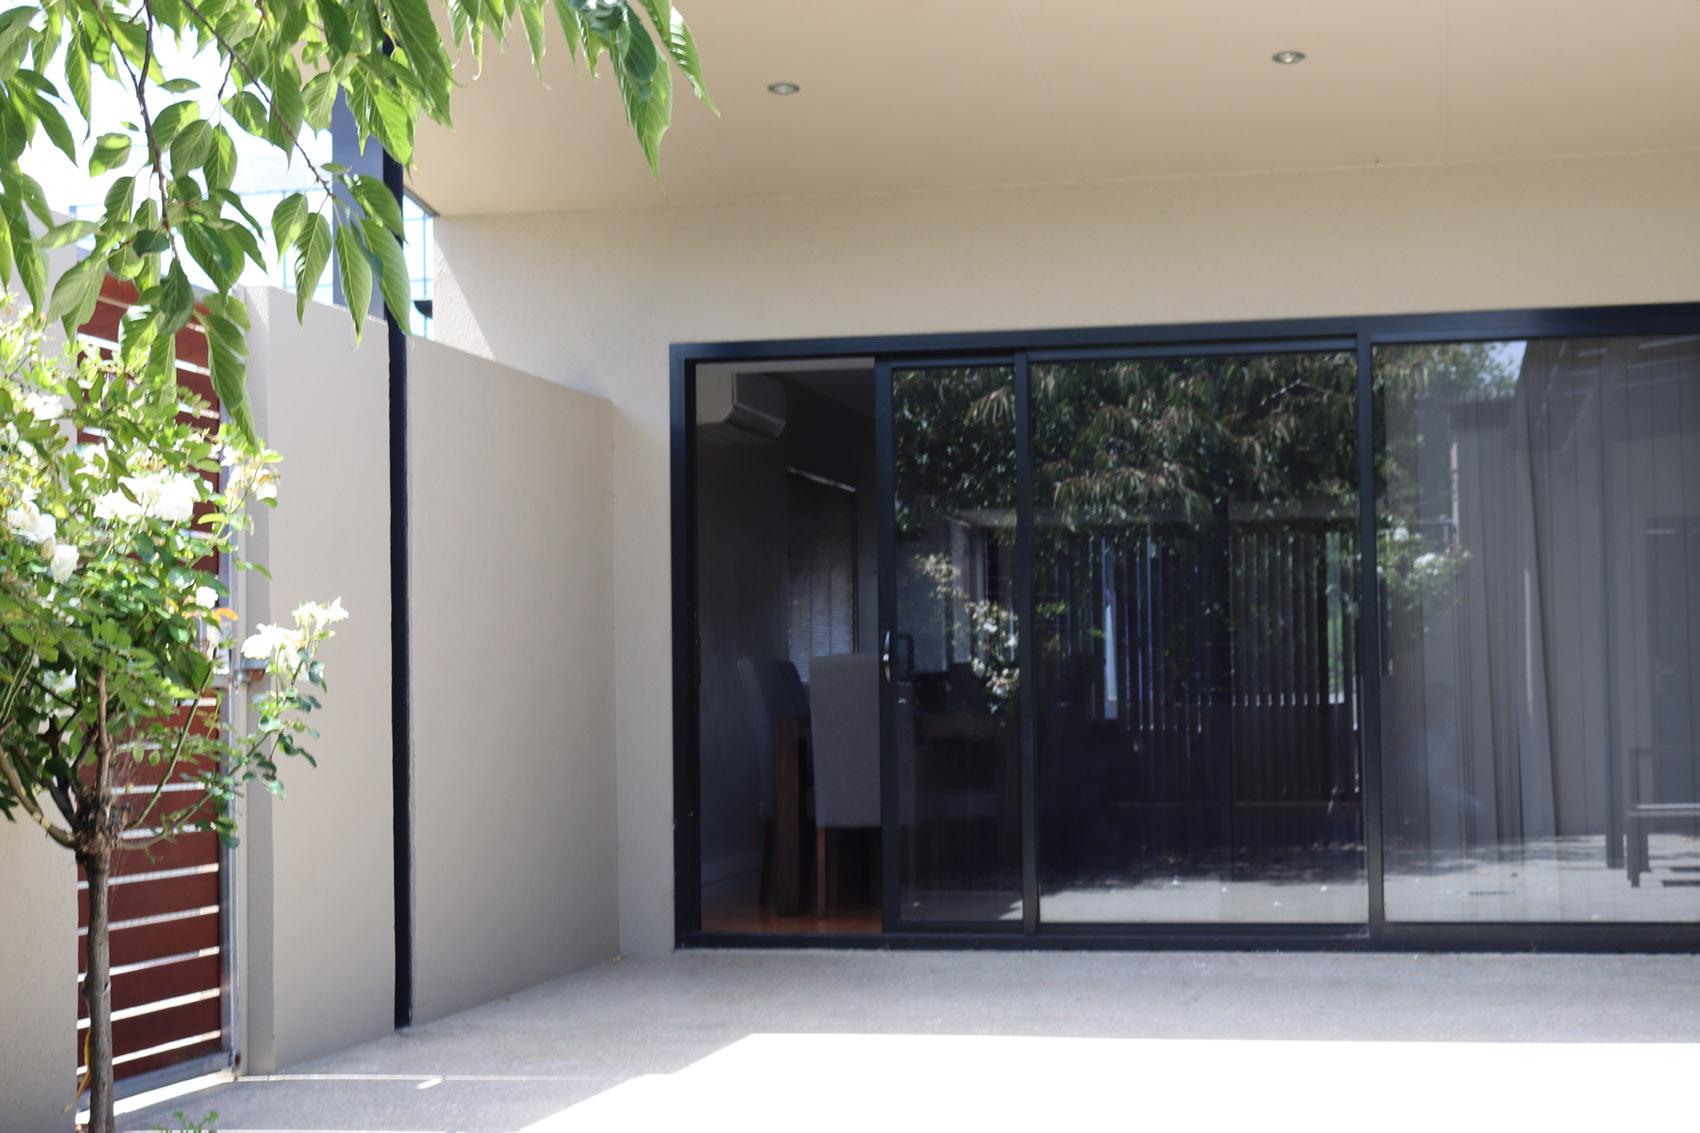 bellerive-tasmania-independent-living-respite-care-NDIS-11-feb-12